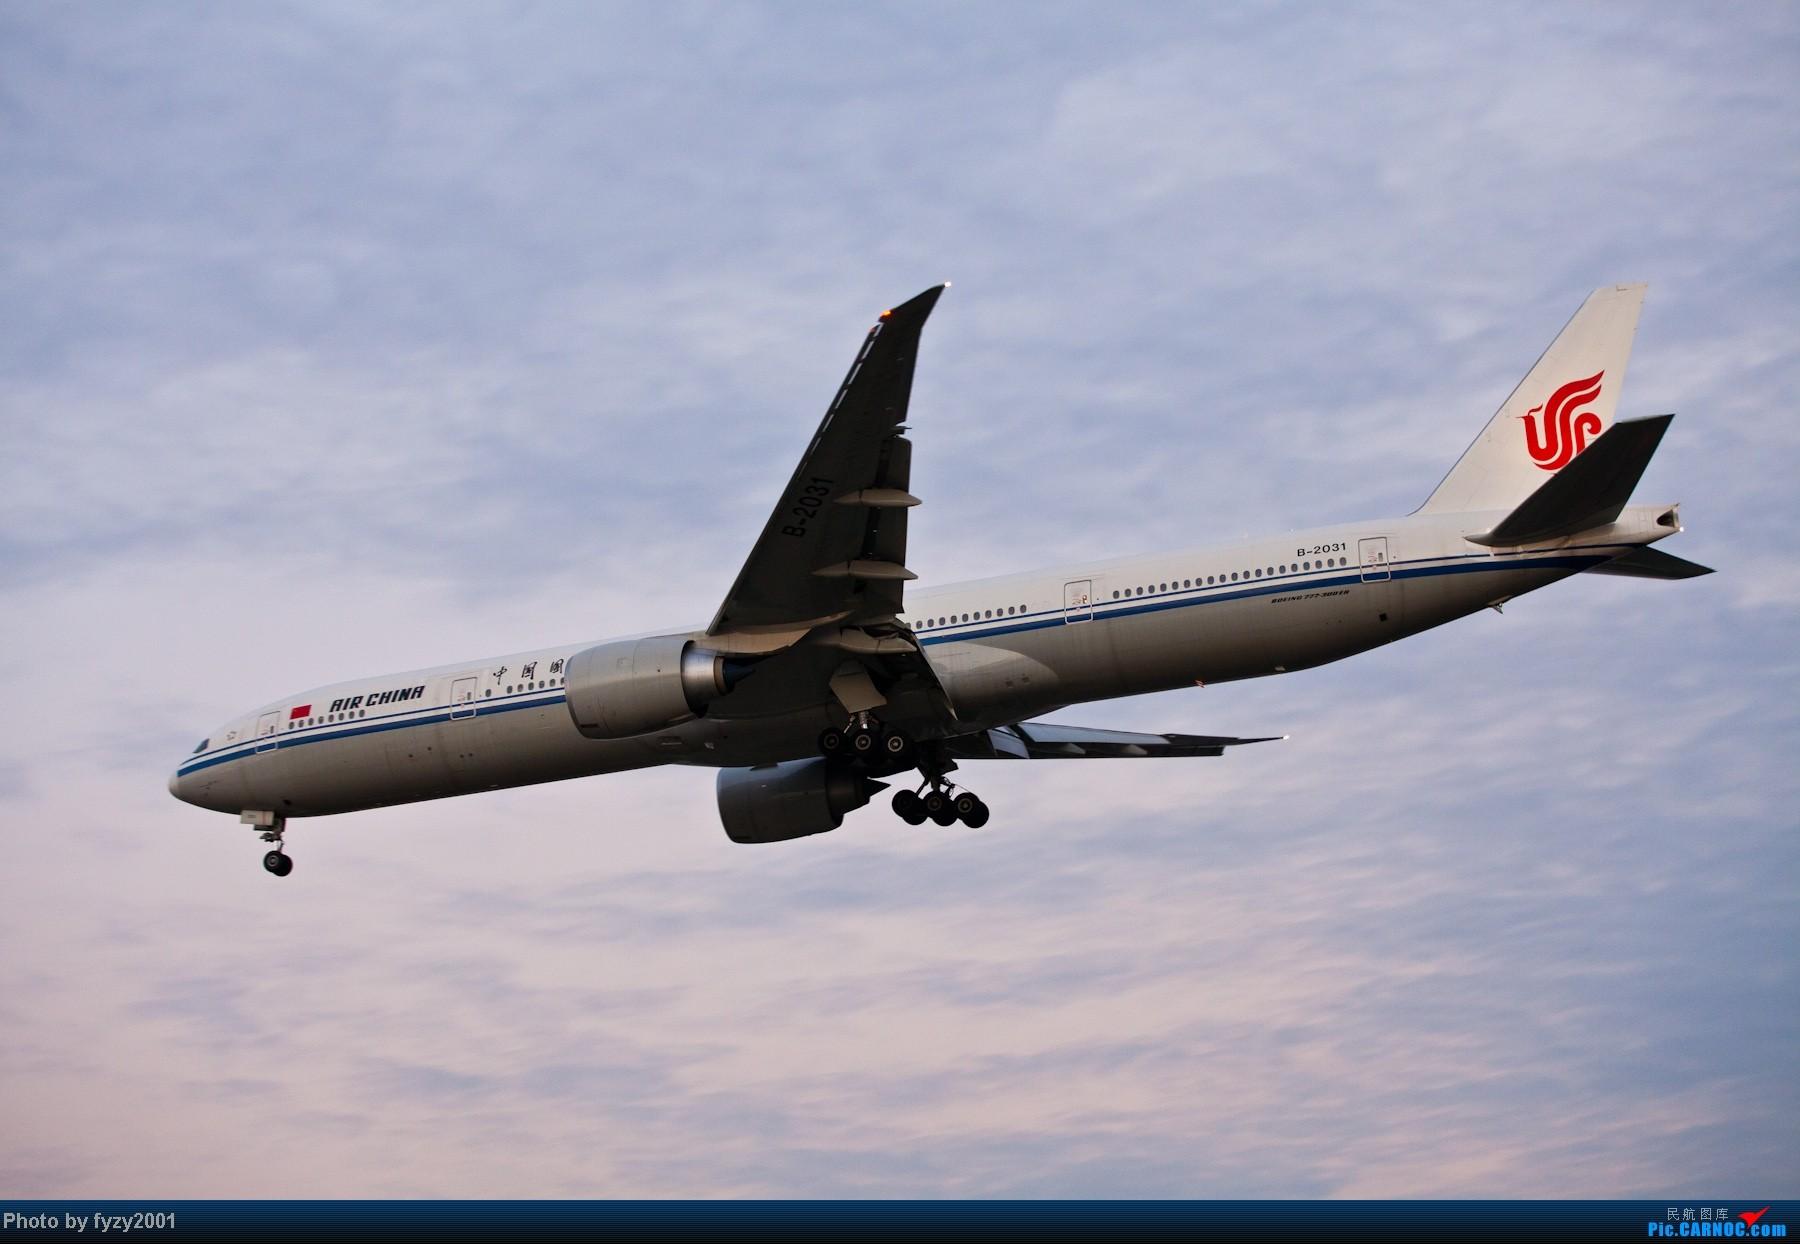 Re:[原创][无锡西站]追逐光影的脚步(1800大图) BOEING 777-300 B-2031 中国上海虹桥机场